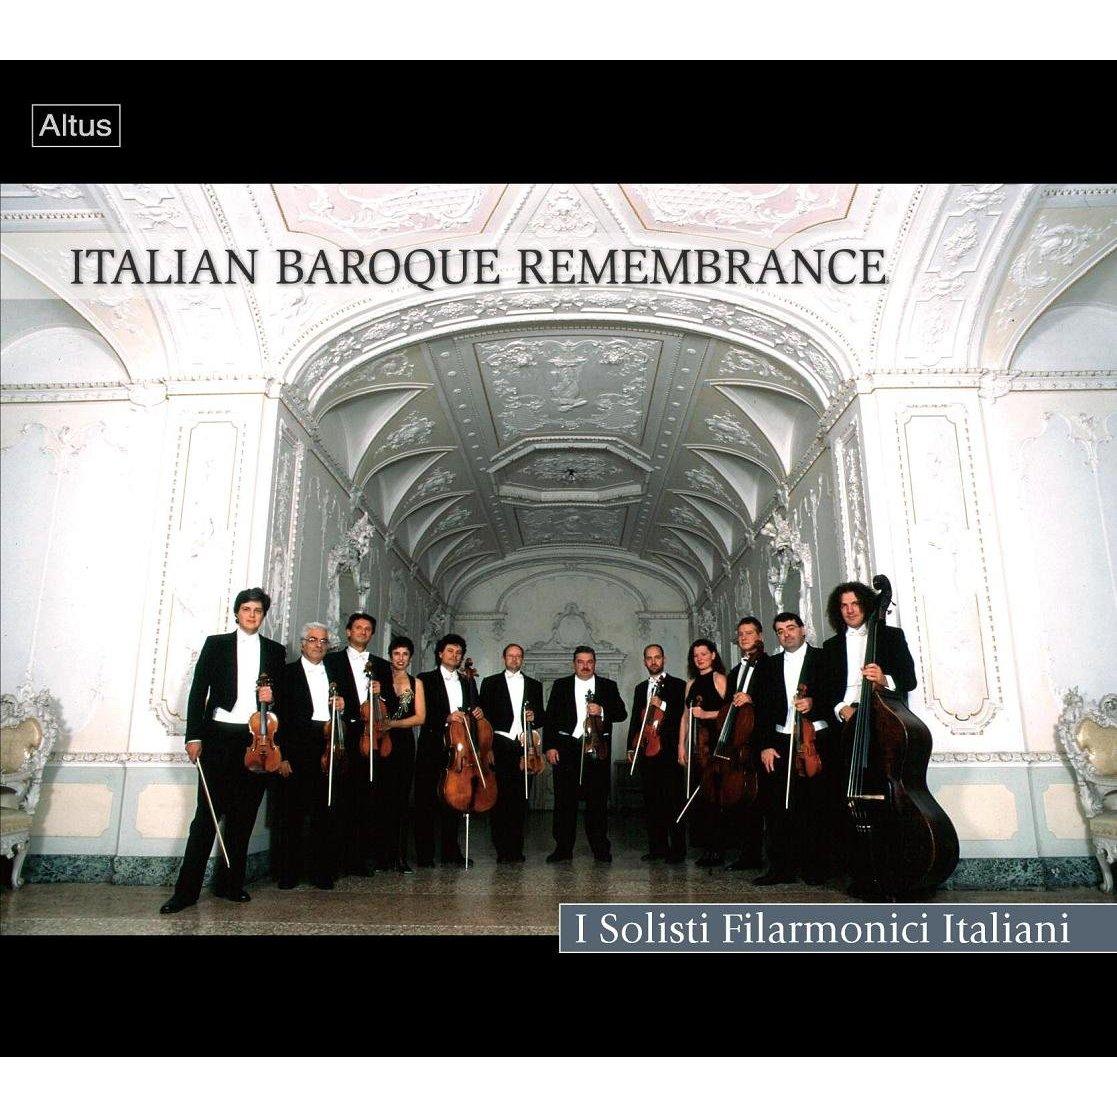 ALT137Solisti Filarmonici Italiani - Italian Baroque Remembrance